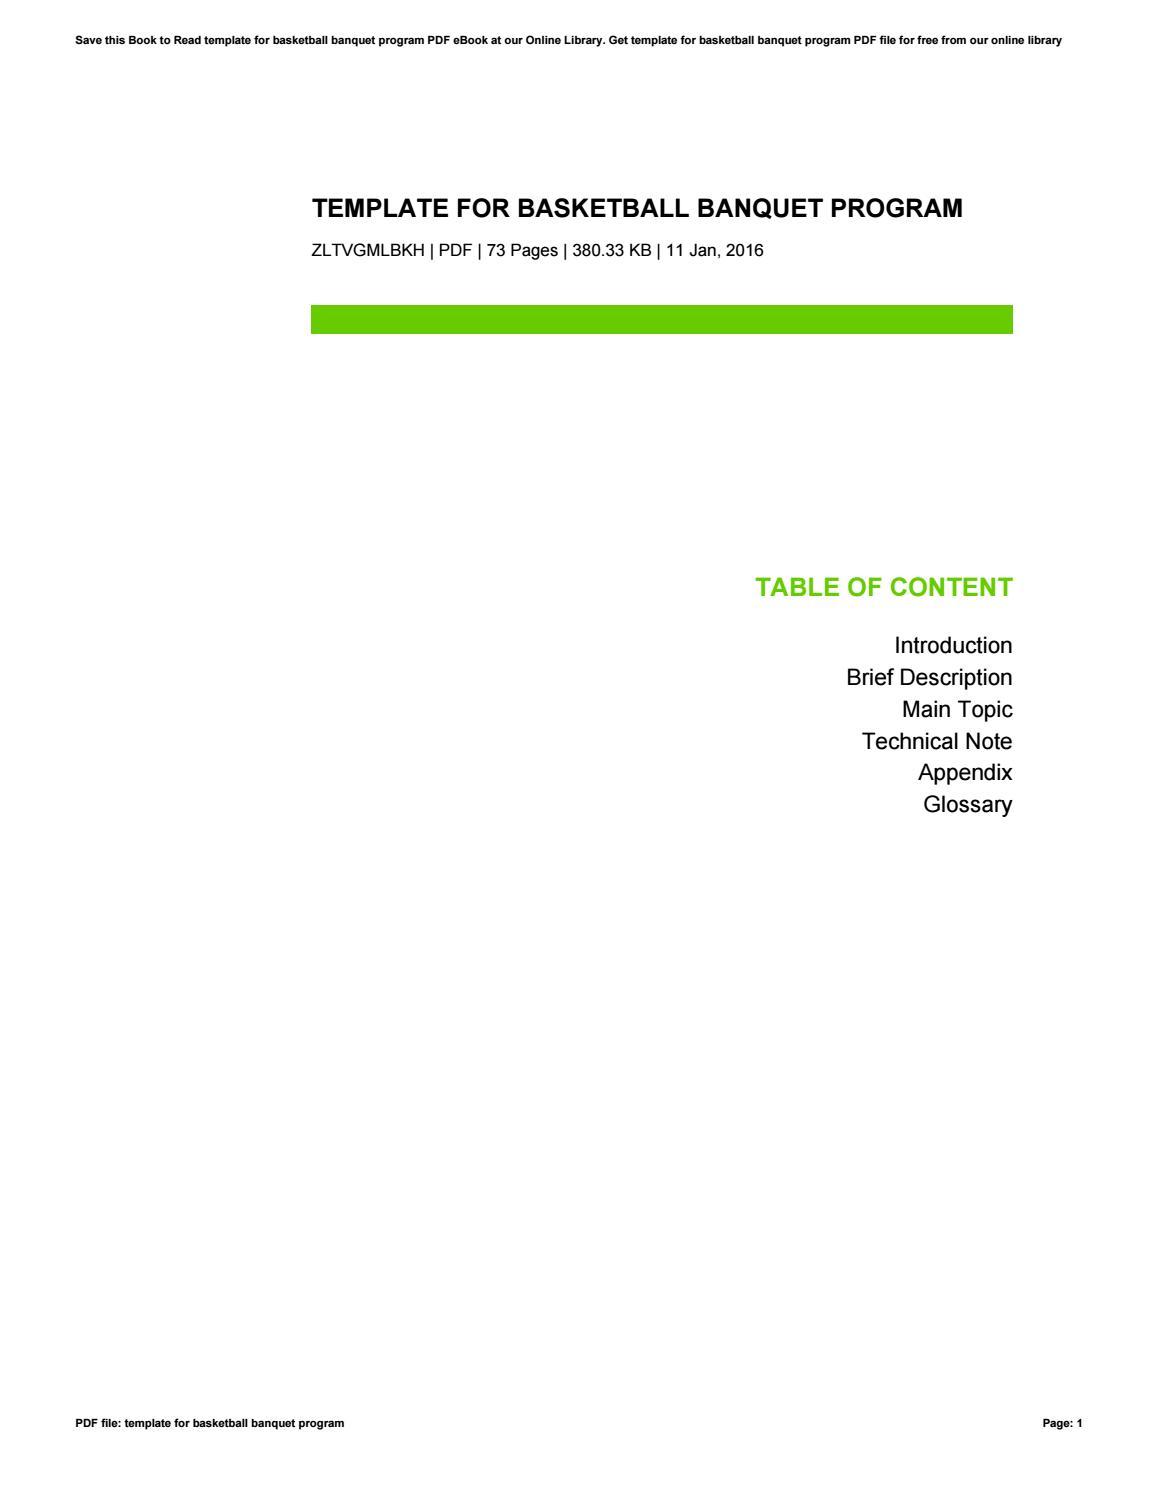 Template For Basketball Banquet Program By Jenniferhinojosa4893 Issuu